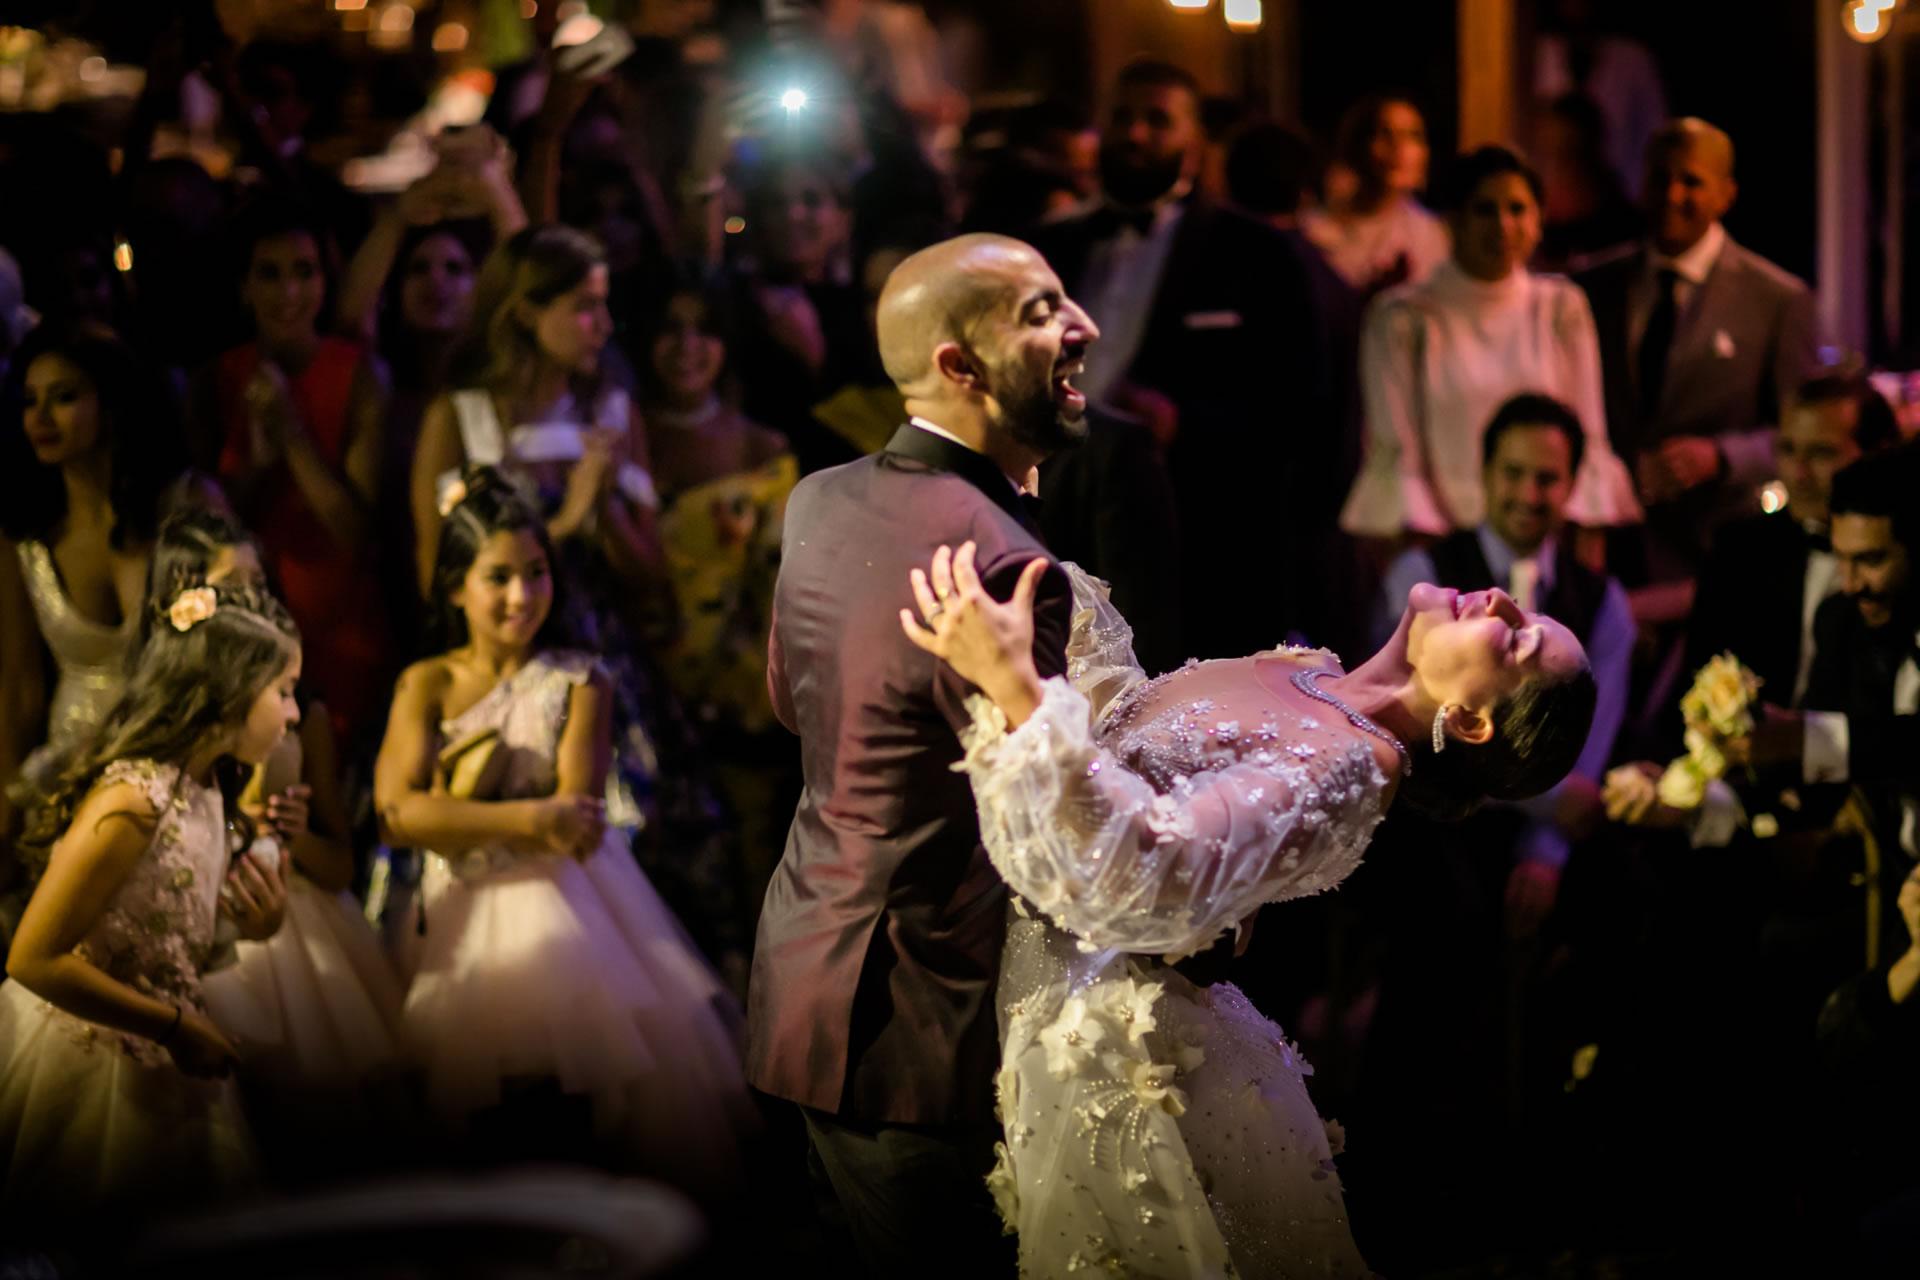 Dances - 73 :: Luxury wedding at Il Borro :: Luxury wedding photography - 72 :: Dances - 73